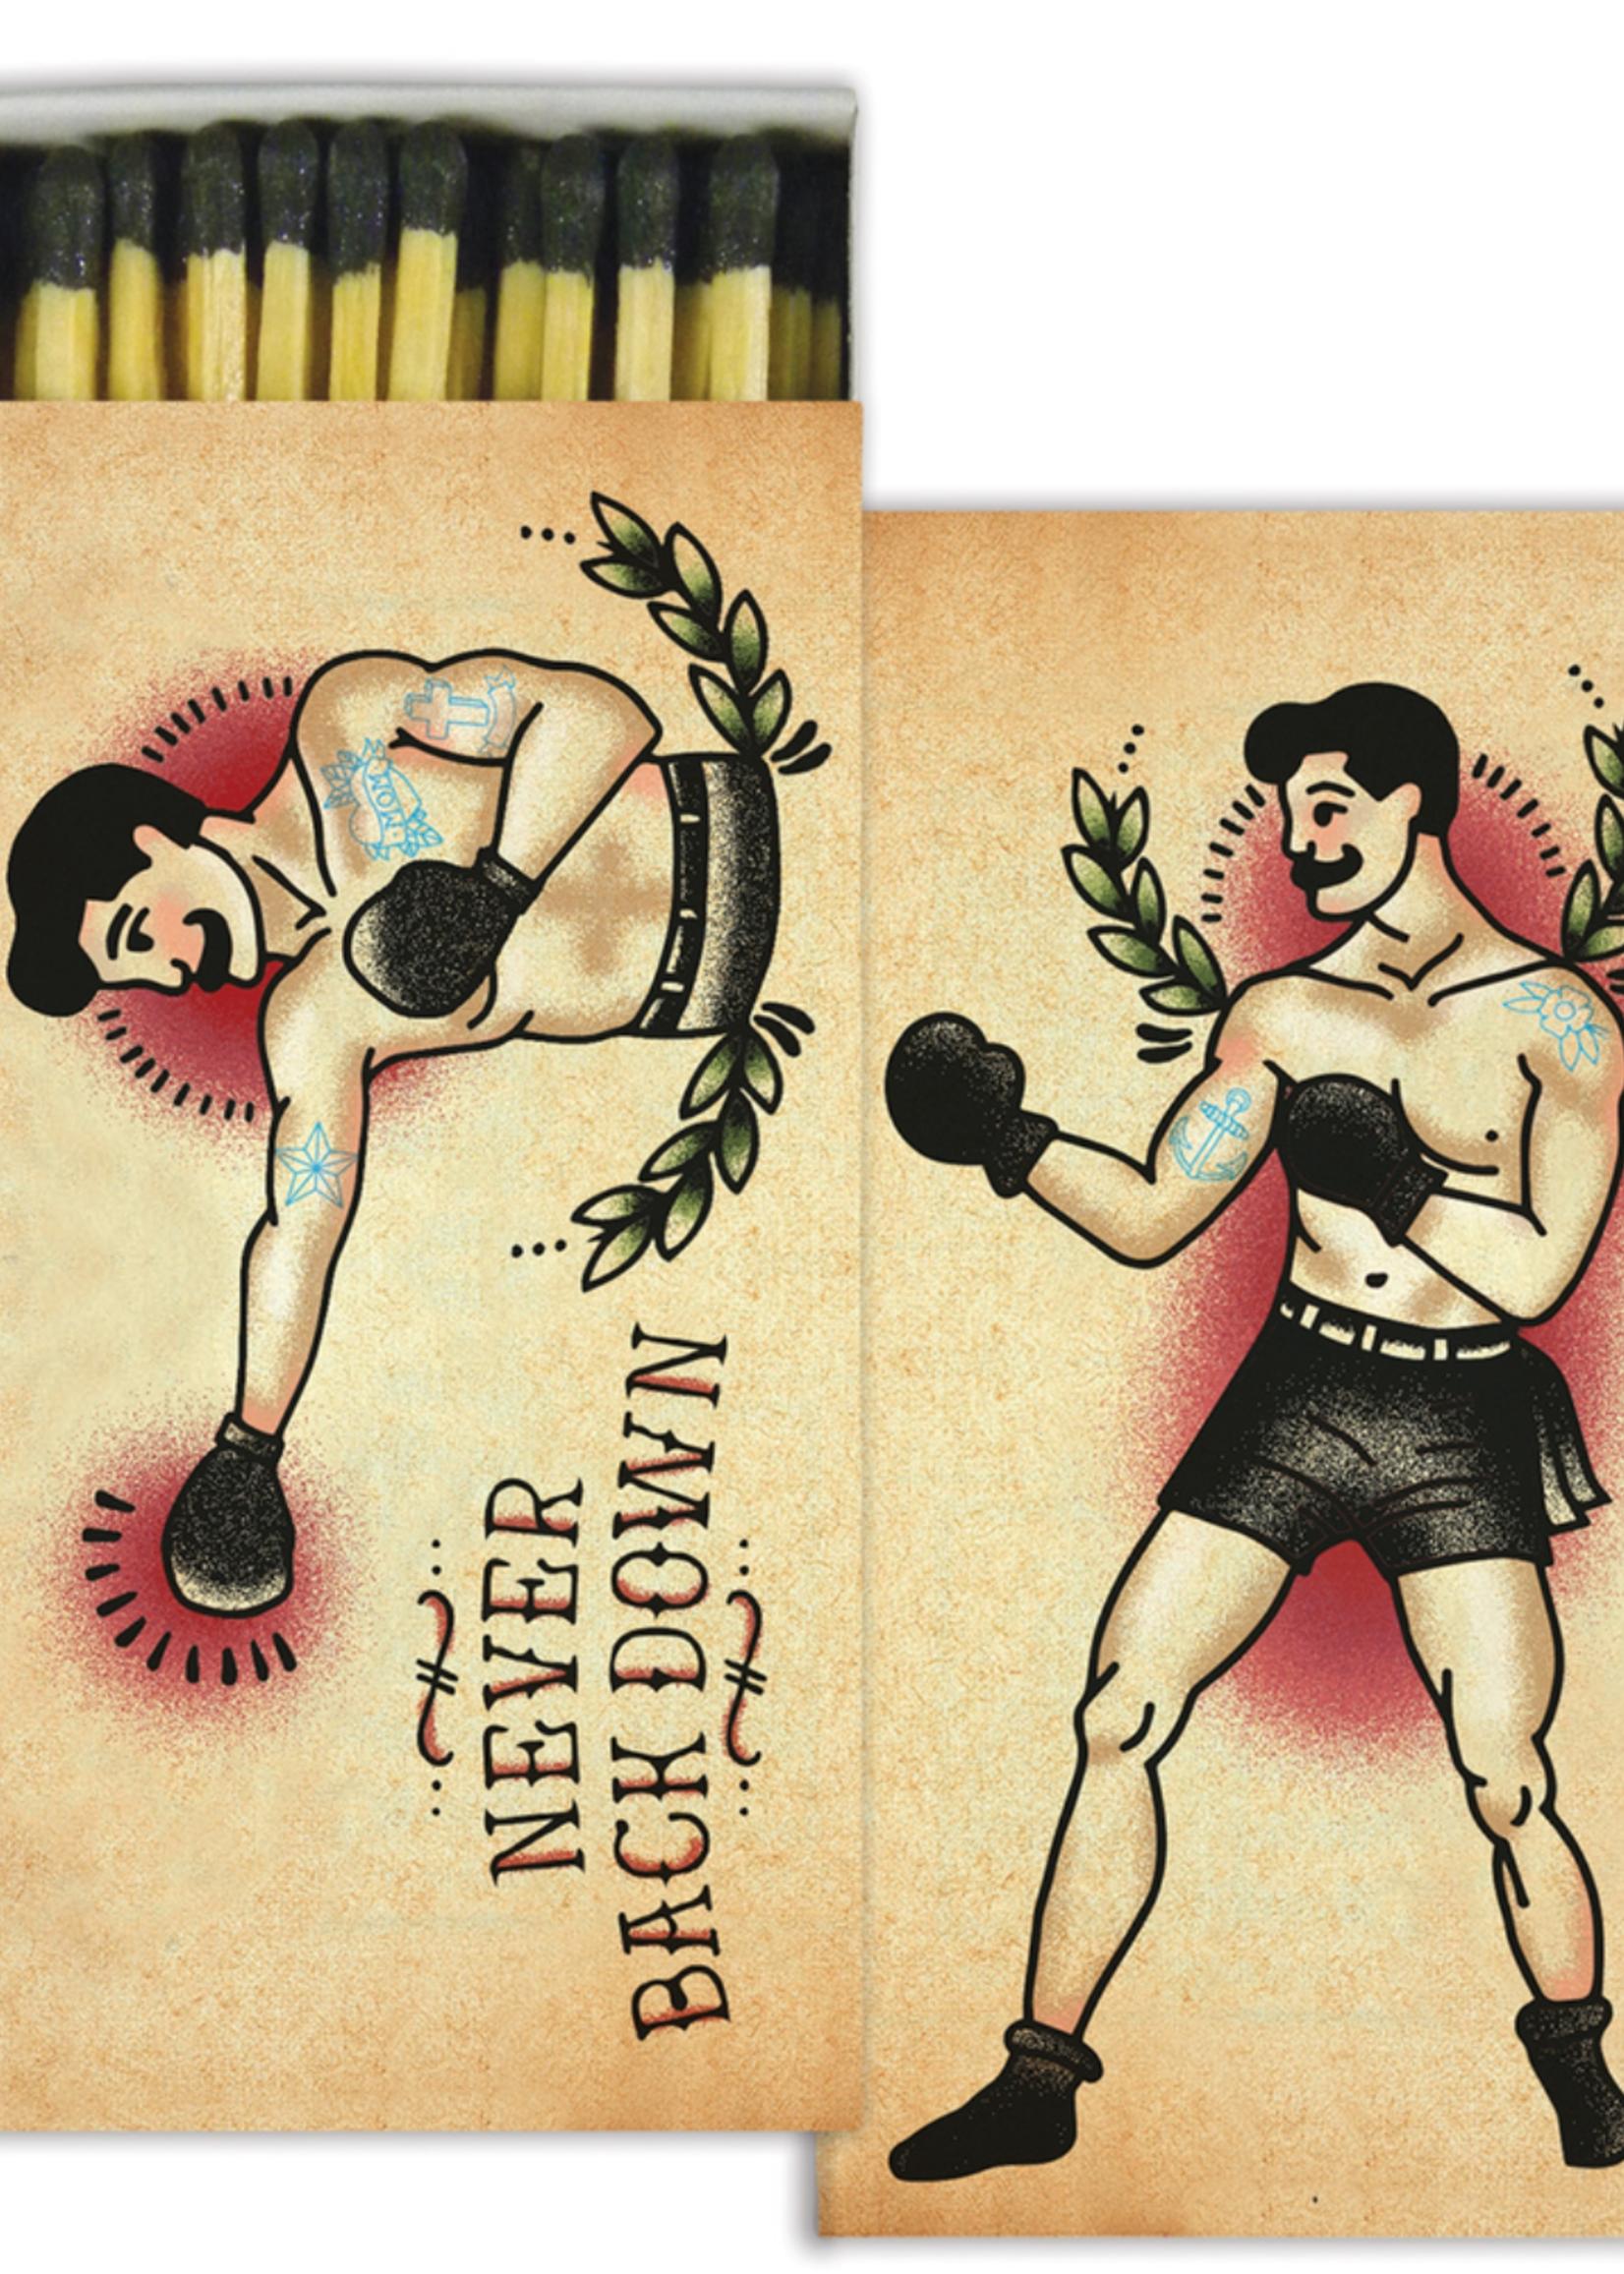 homart homart boxer matches